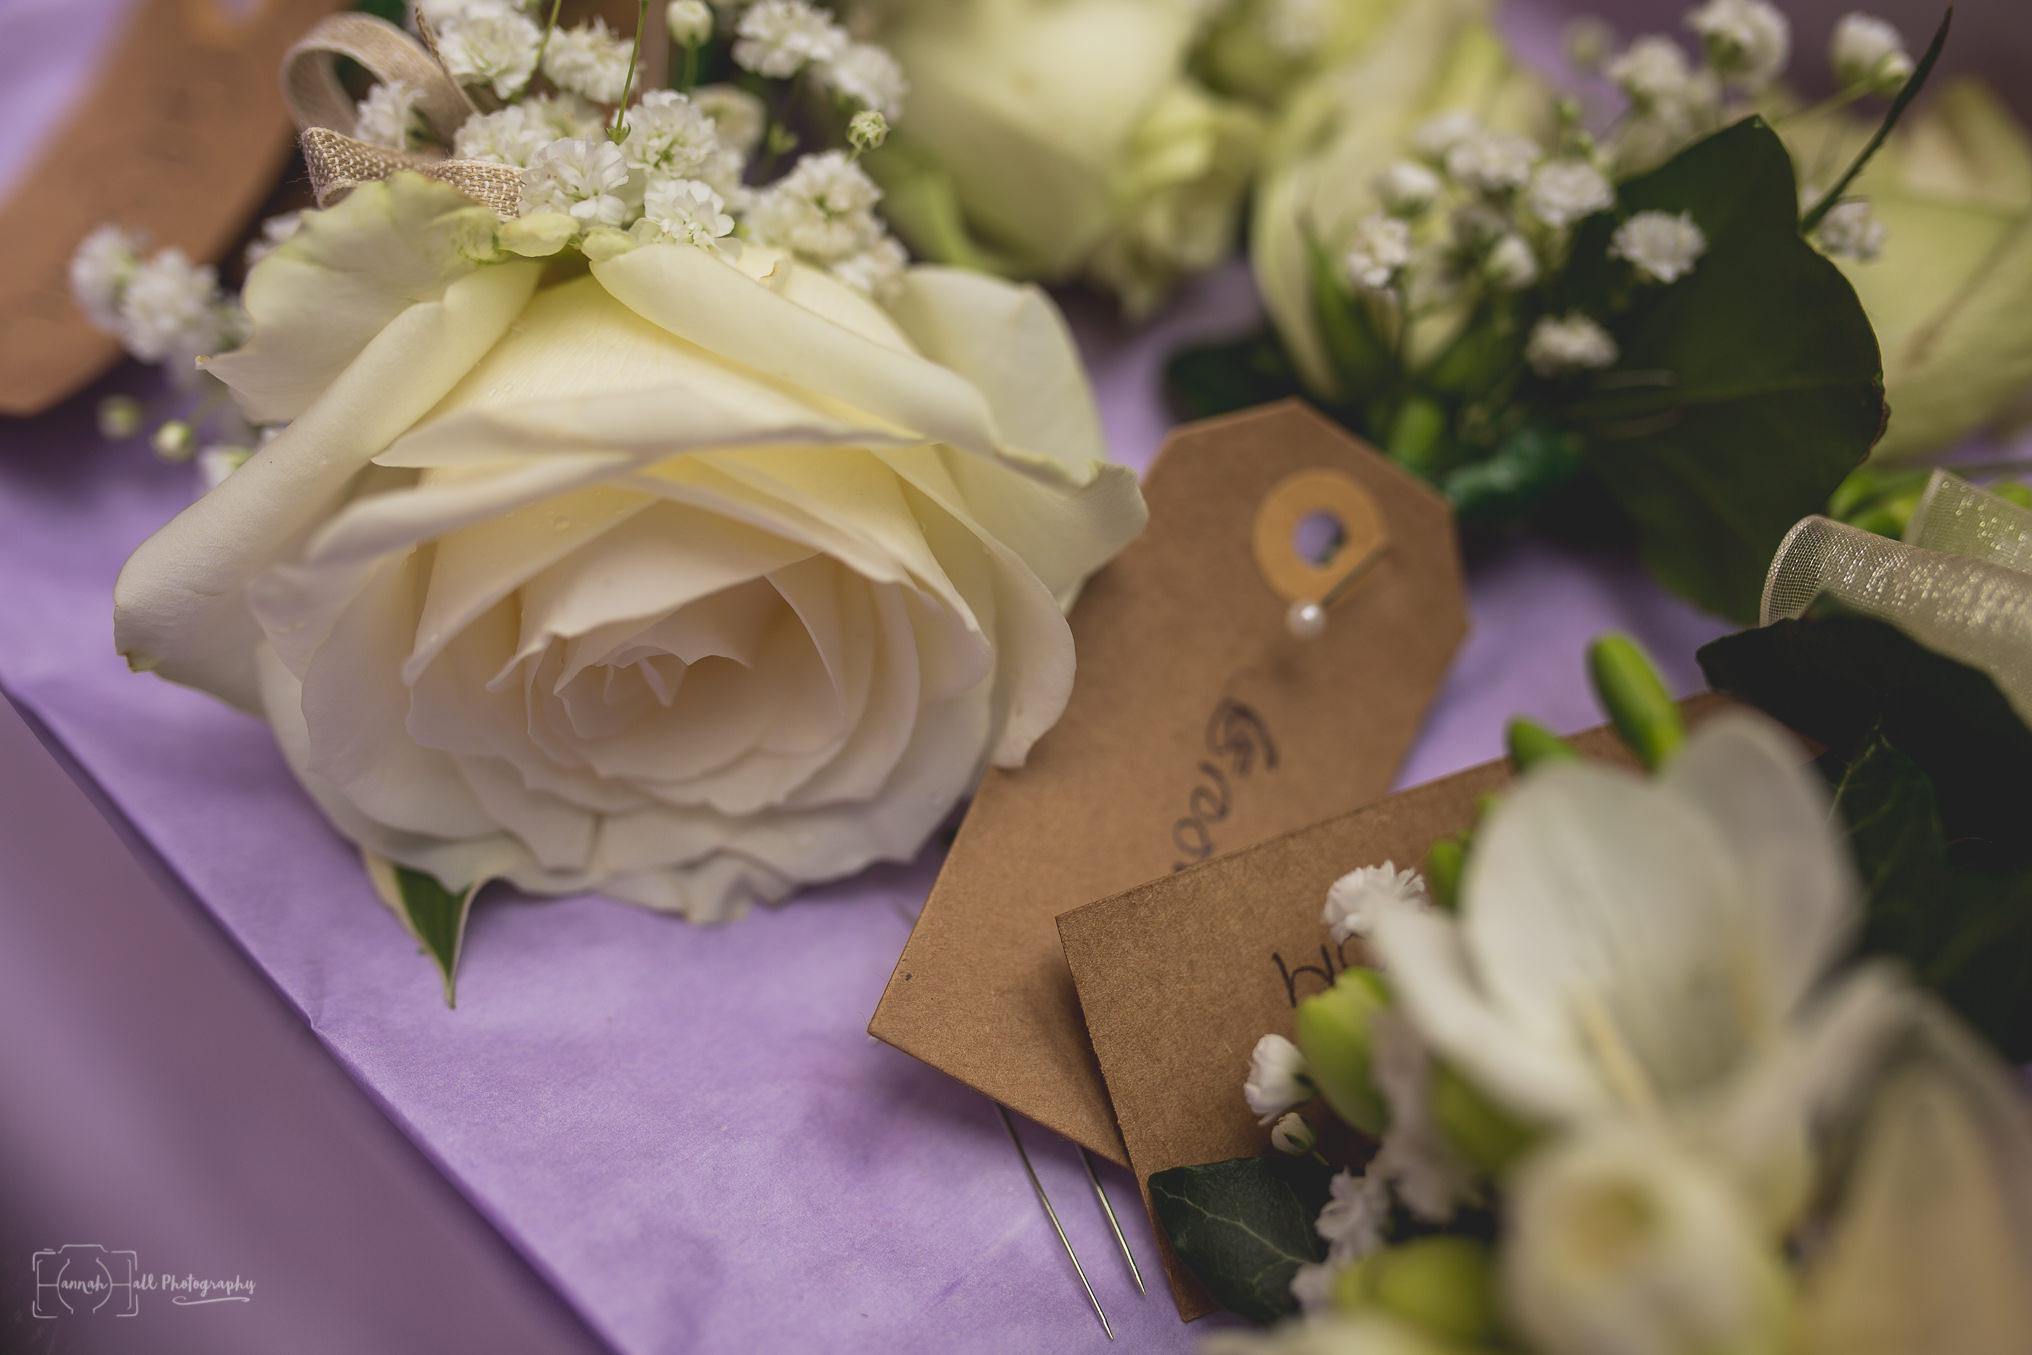 HHP-6-st-chads-place-wedding-10